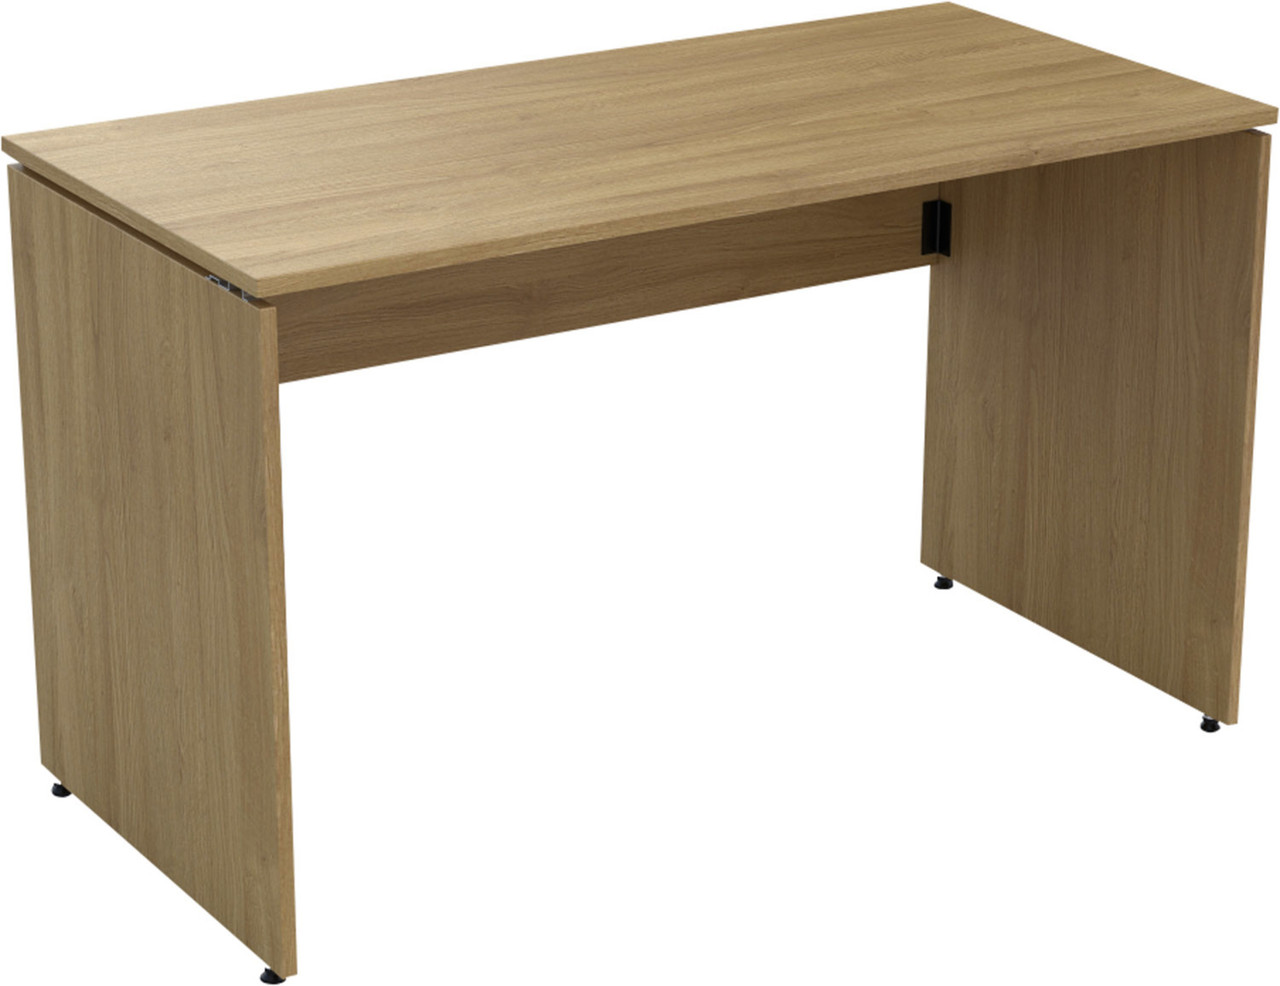 Ambus Folding Desk